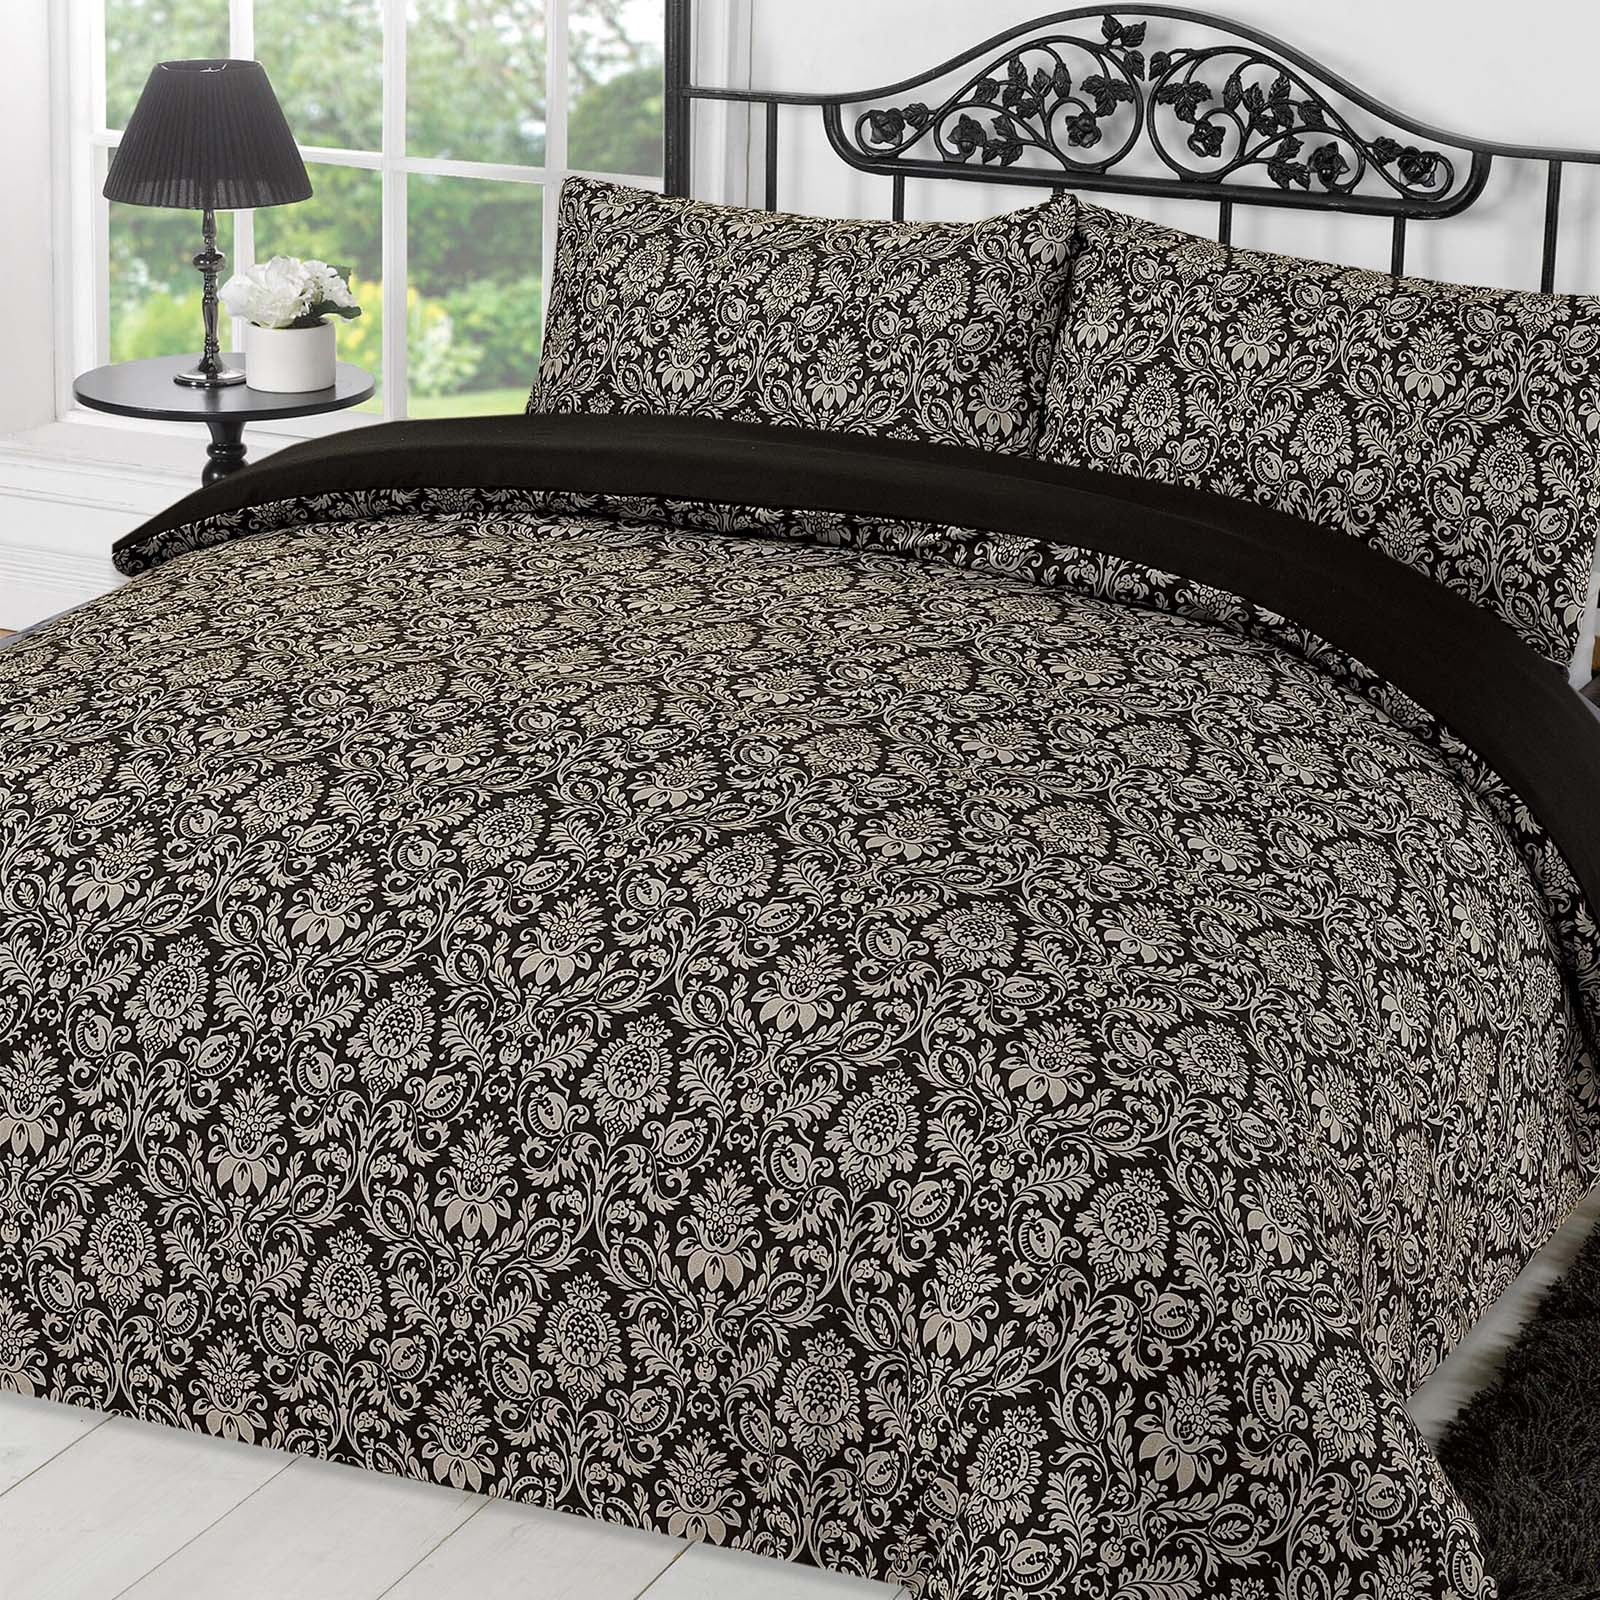 Dreamscene Damask Duvet Cover with Pillowcase Bedding Set Sanctuary